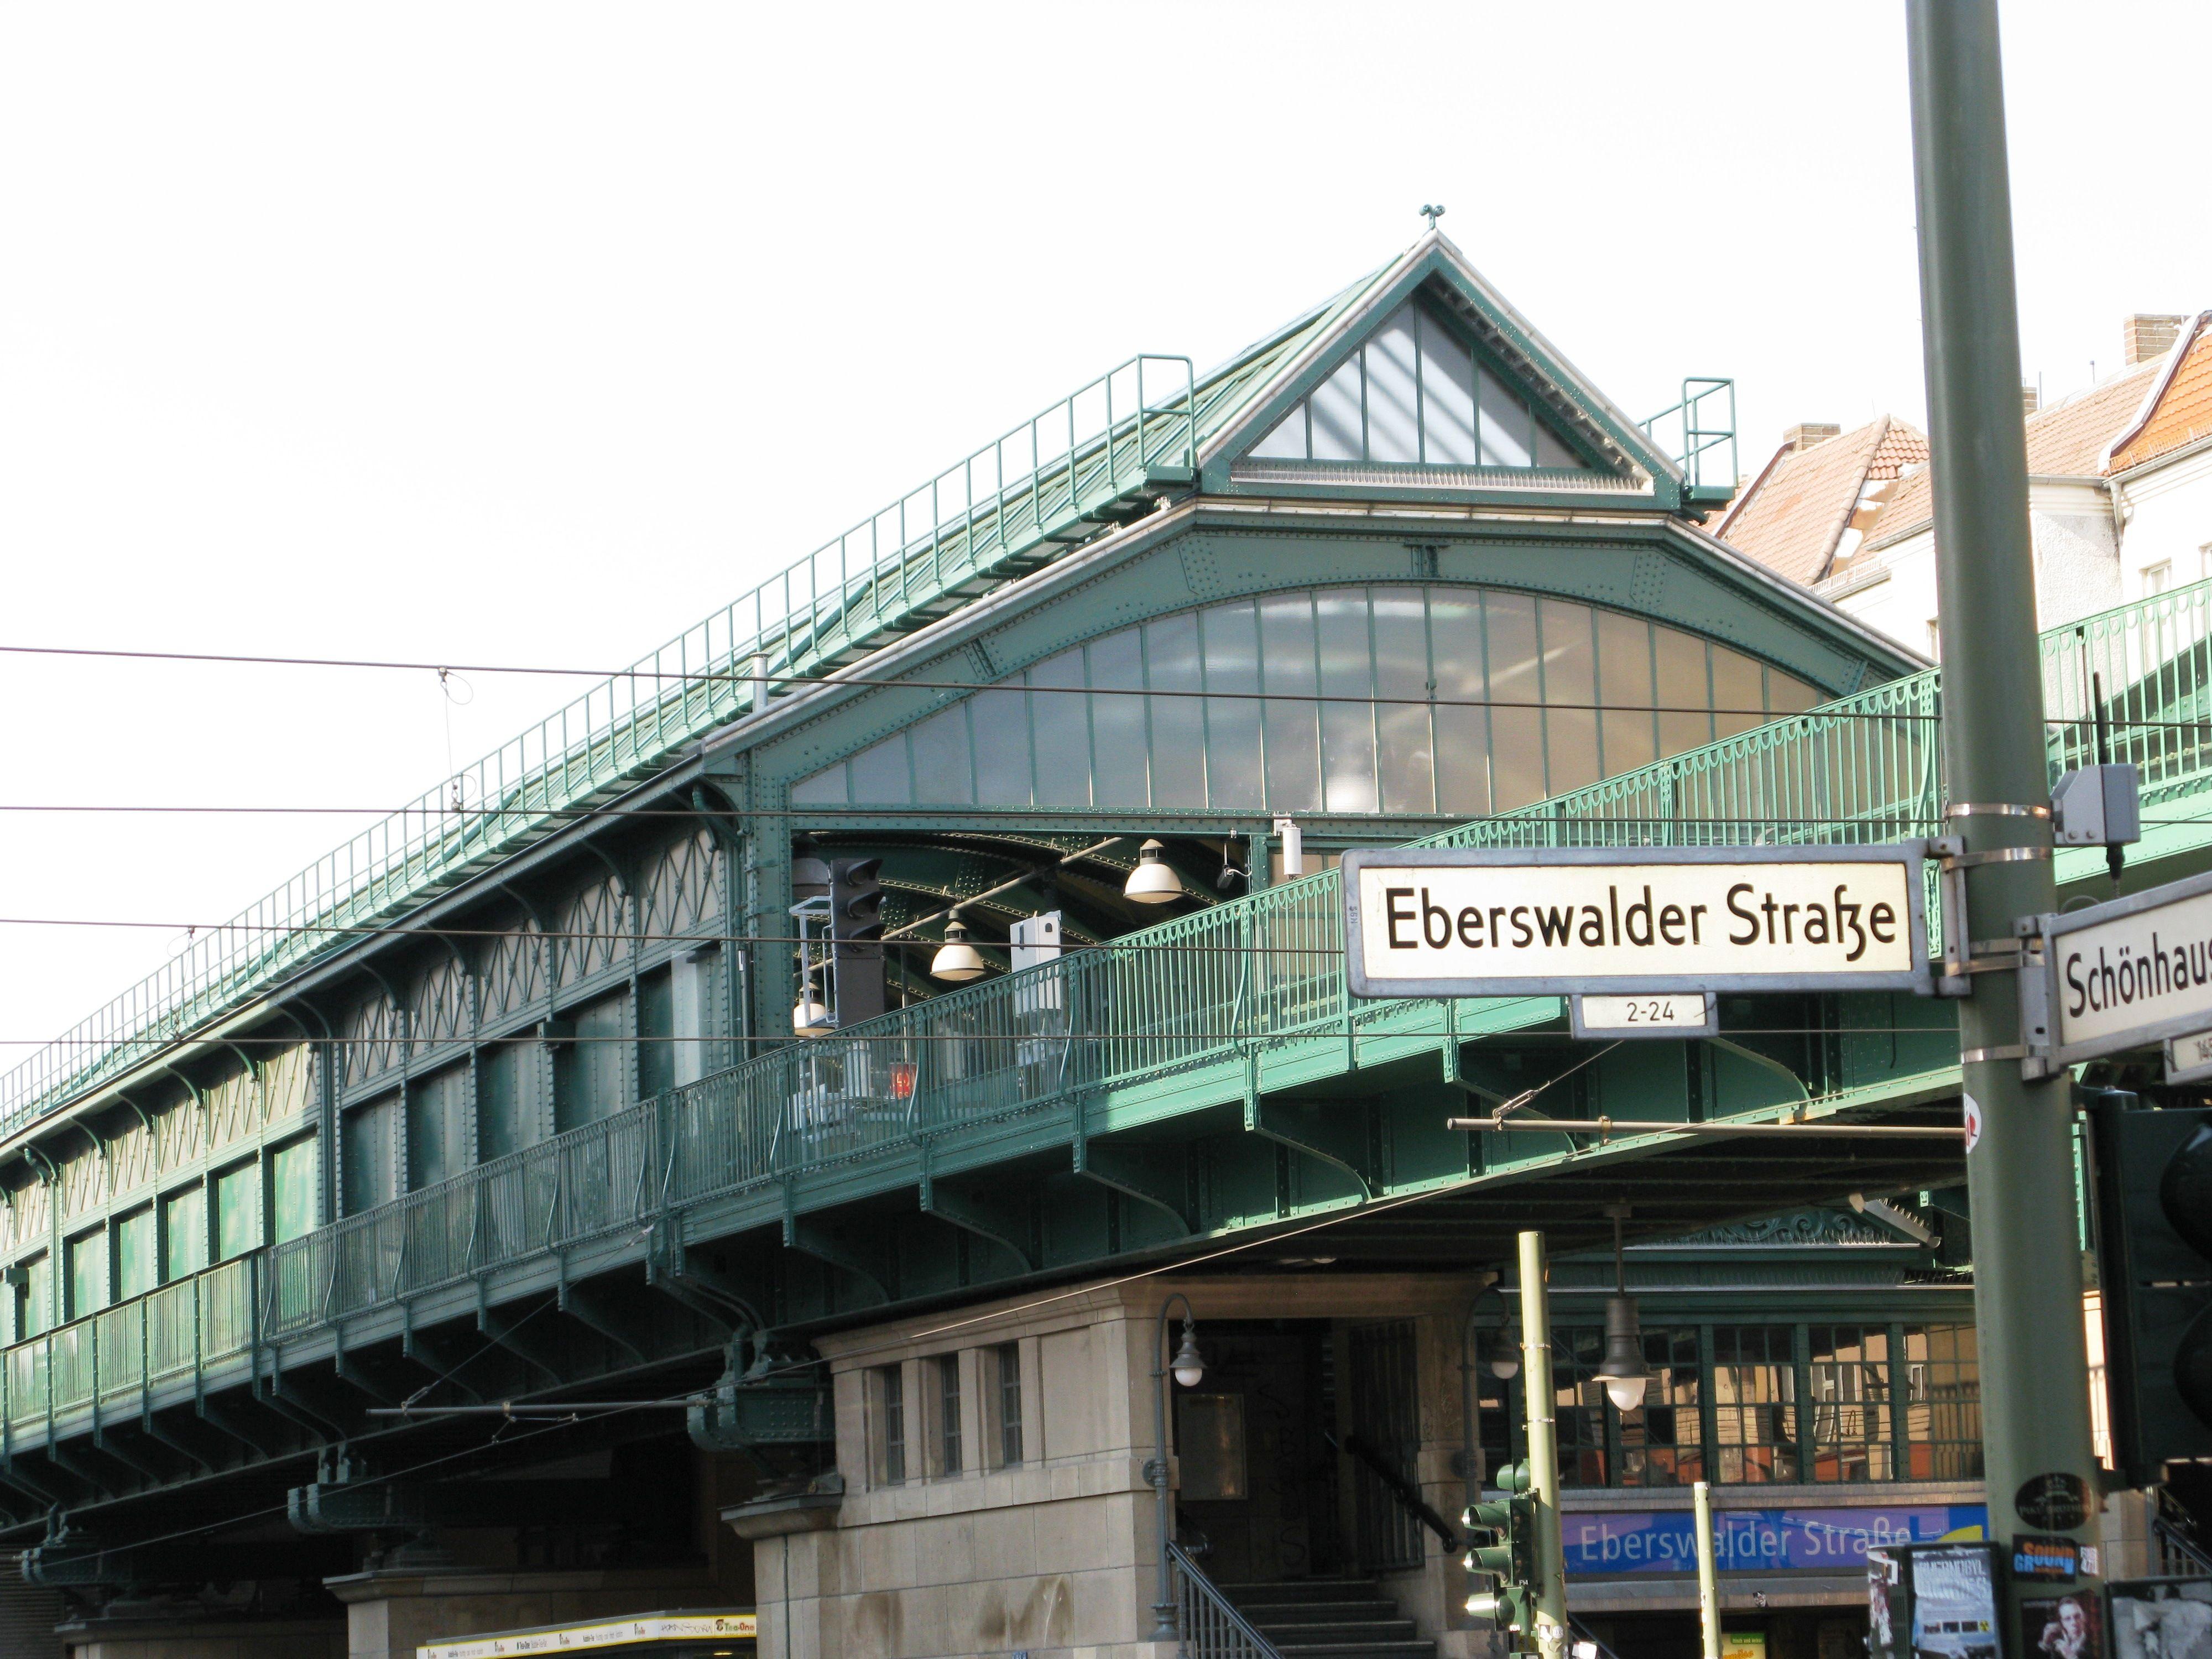 Eberswalder Strasse U Bahn Station Prenslauer Berg Berlin Germany Bahn Berlin U Bahn Station U Bahn